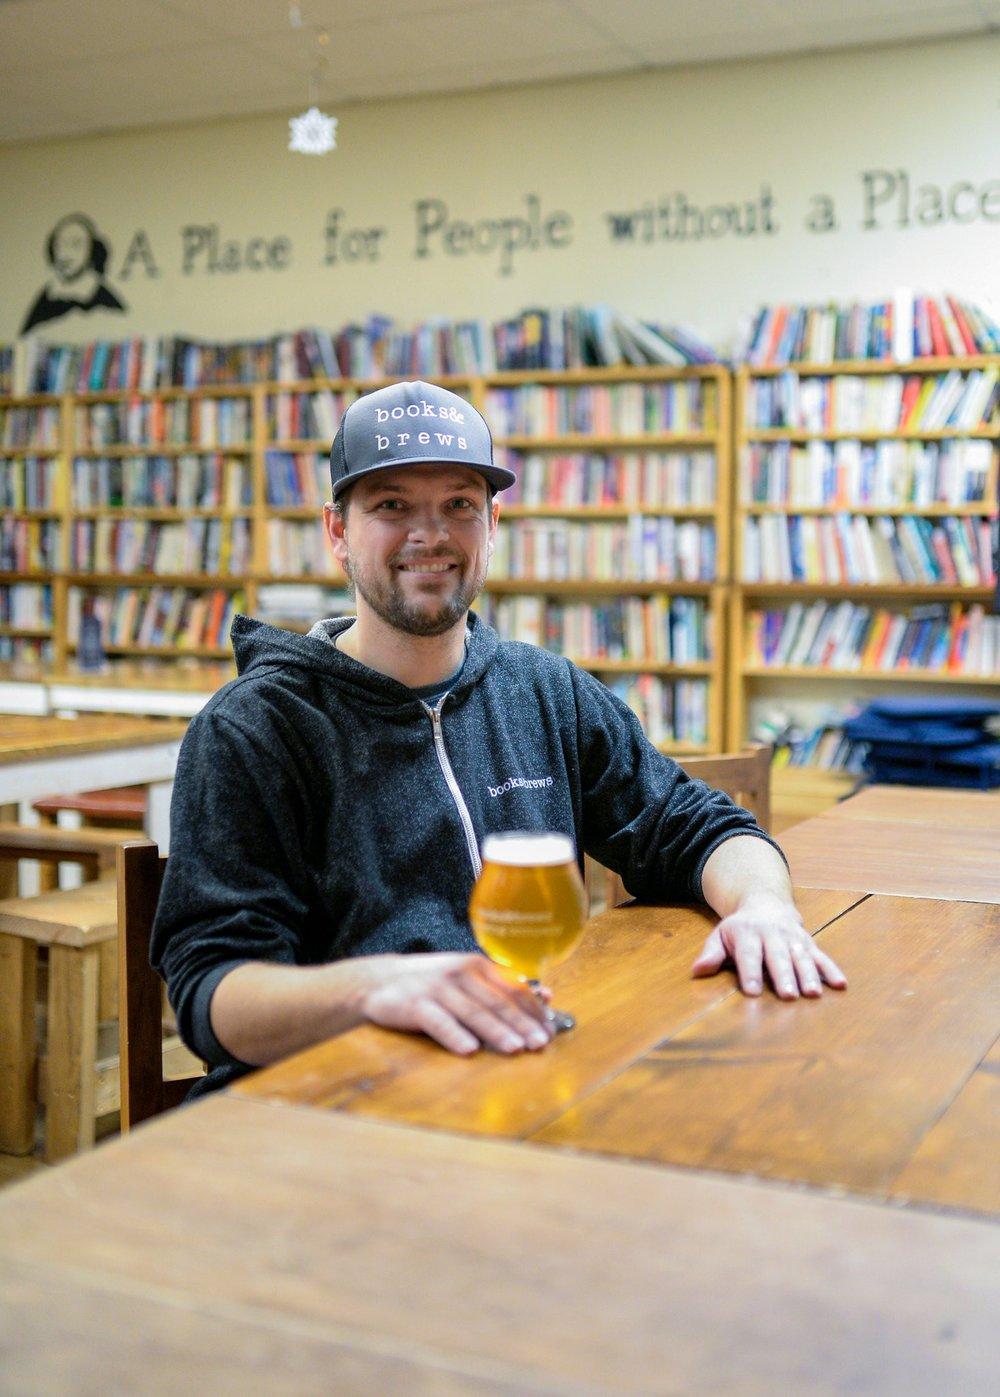 Flat12's new owner, Jason Wuerfel of Books & Brews